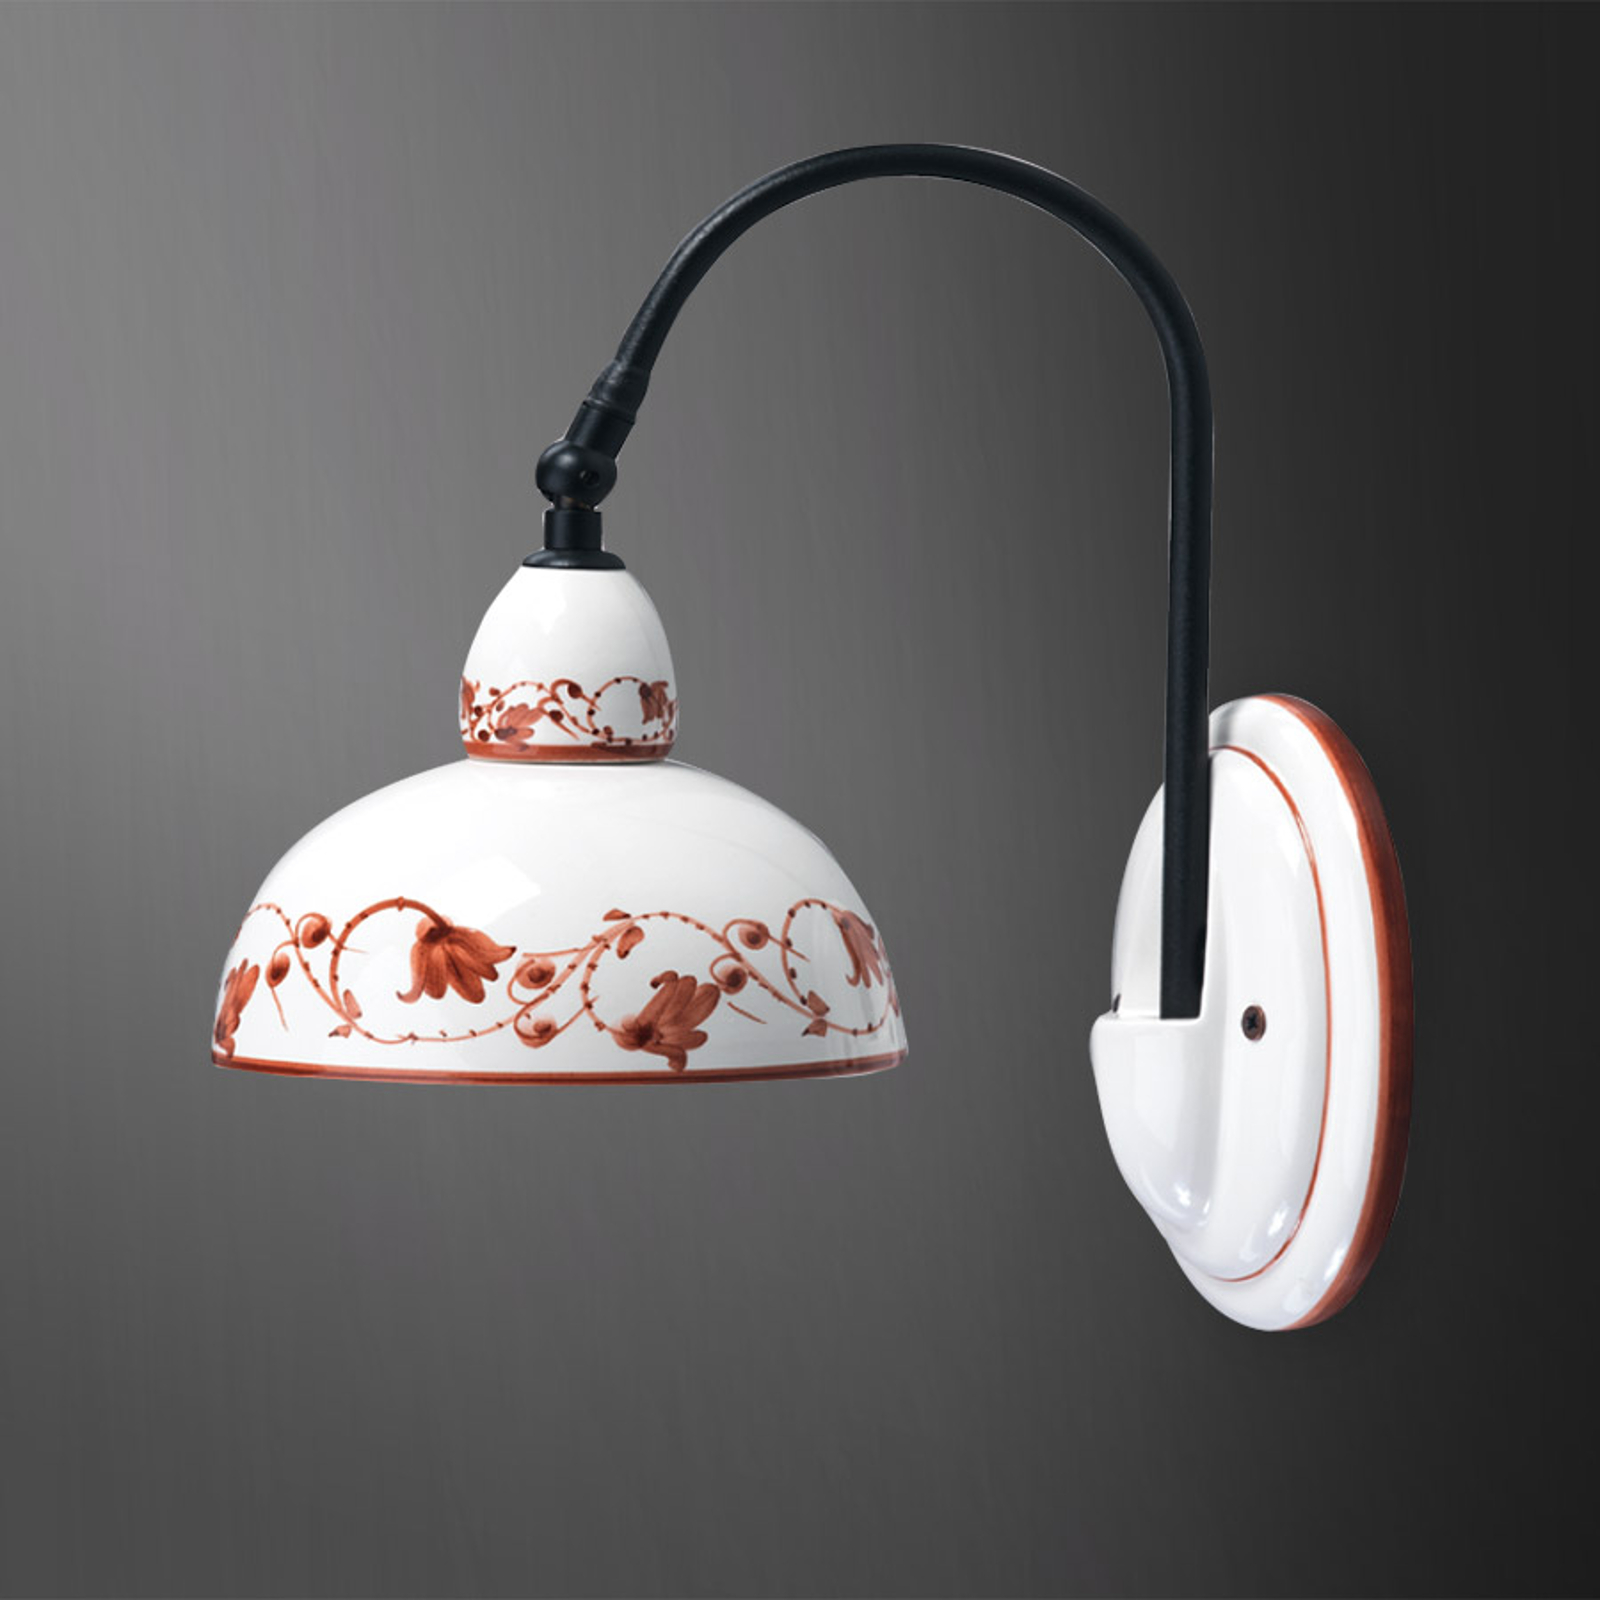 Hnedé vzorované keramické svietidlo Murano II_3046155_1